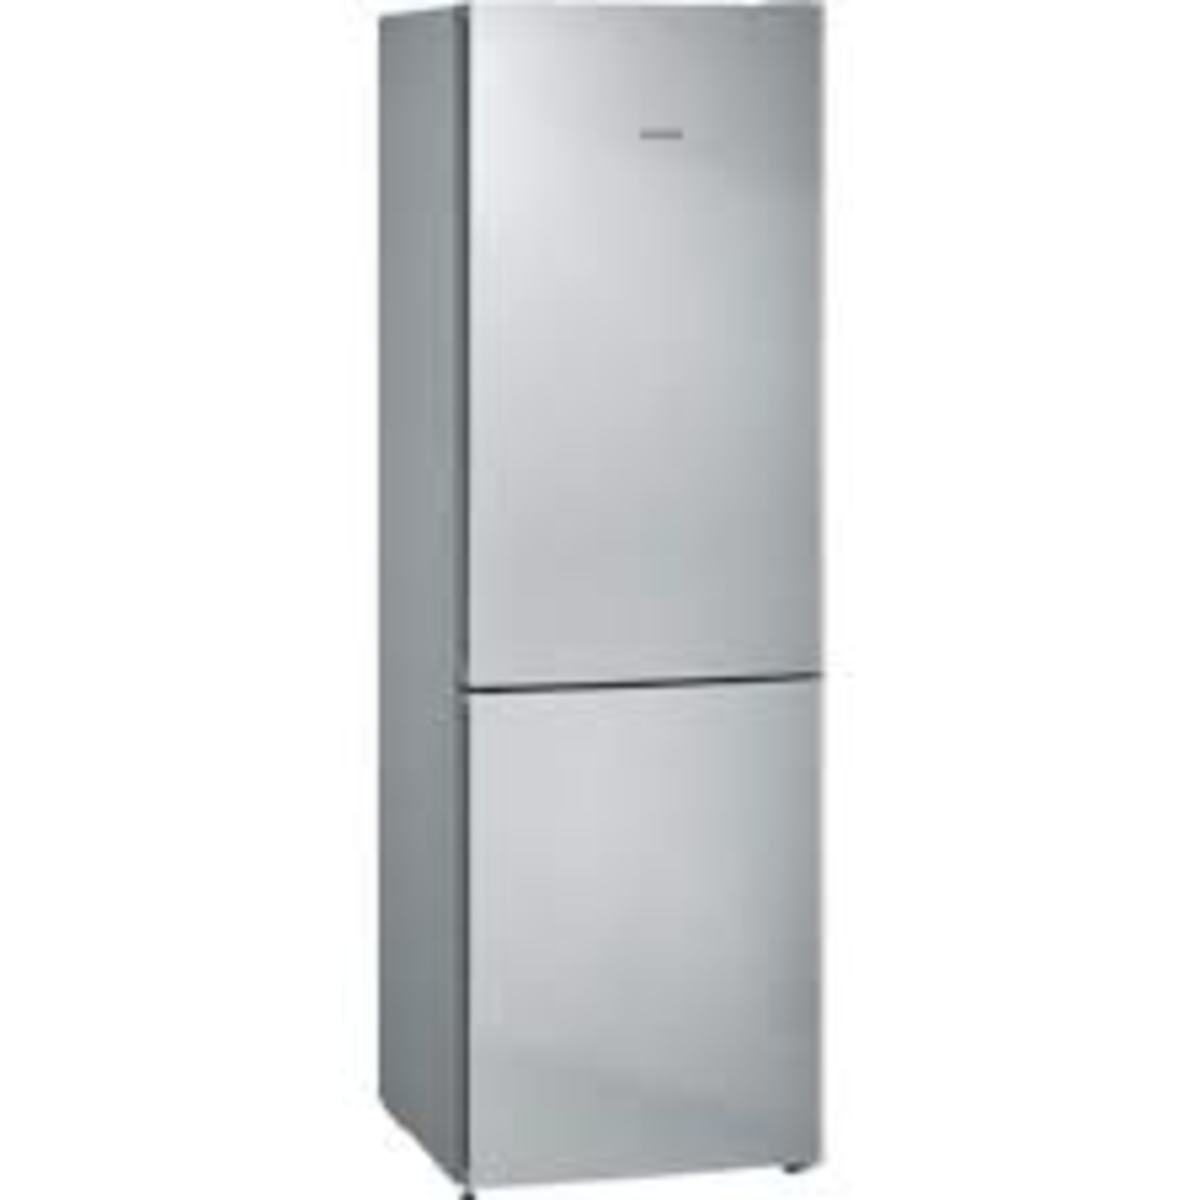 KG36NNL30K 329L iQ100 Bottom-freezer 2-door Refrigerator